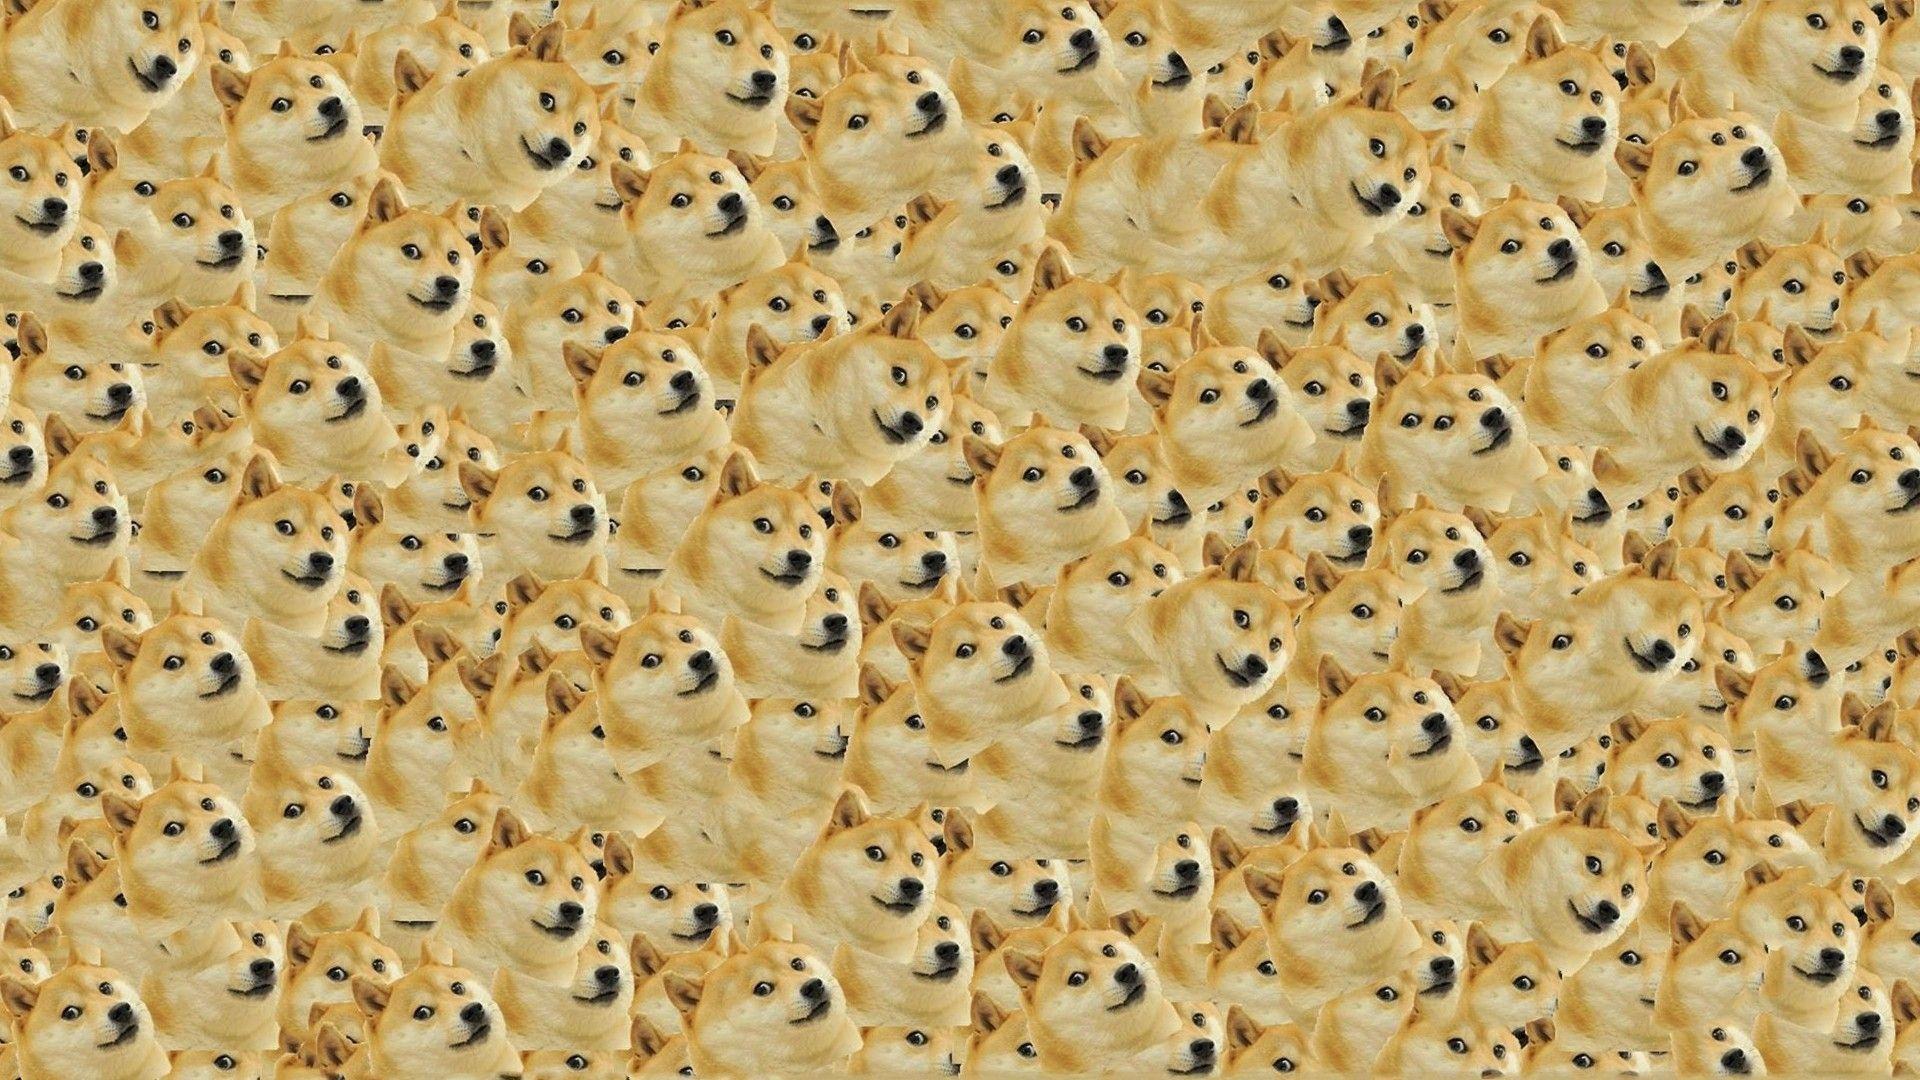 Doge in SPACE – Doge Wallpaper (1920×1080) (14011)